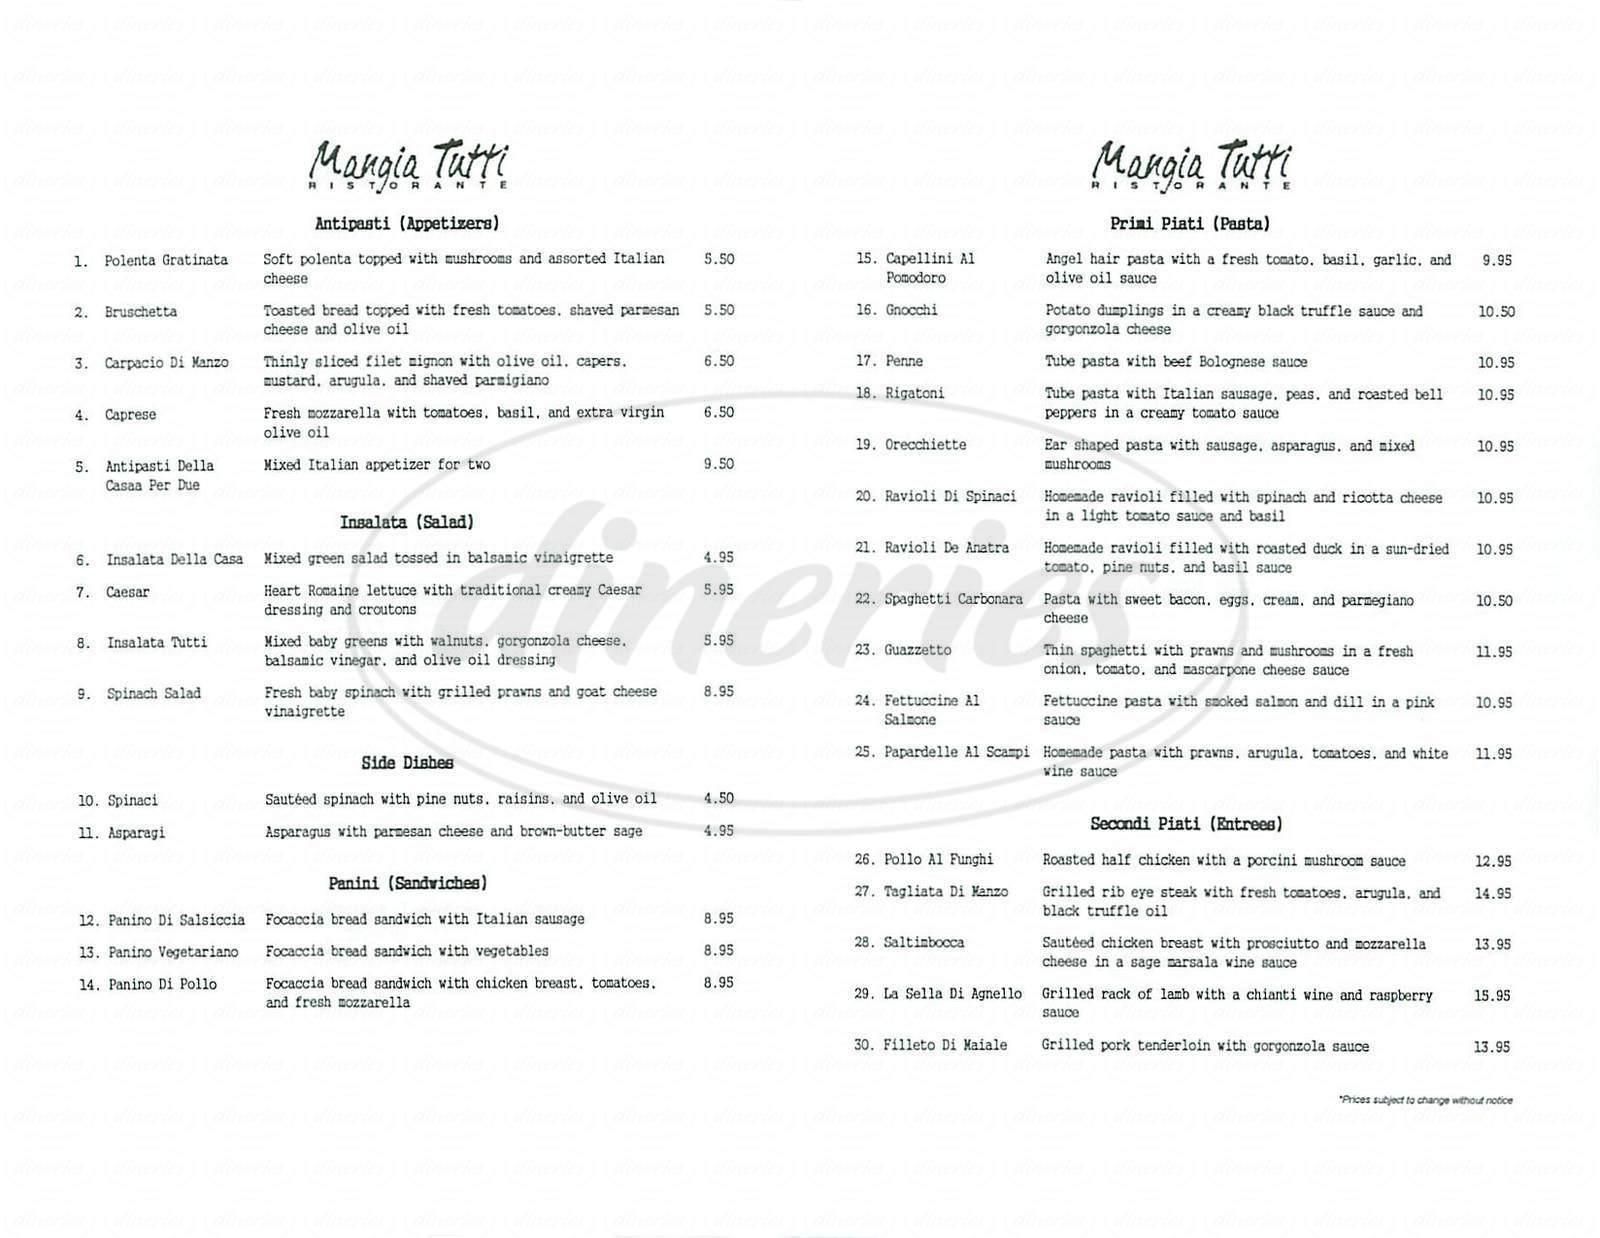 menu for Mangia Tutti Ristorante